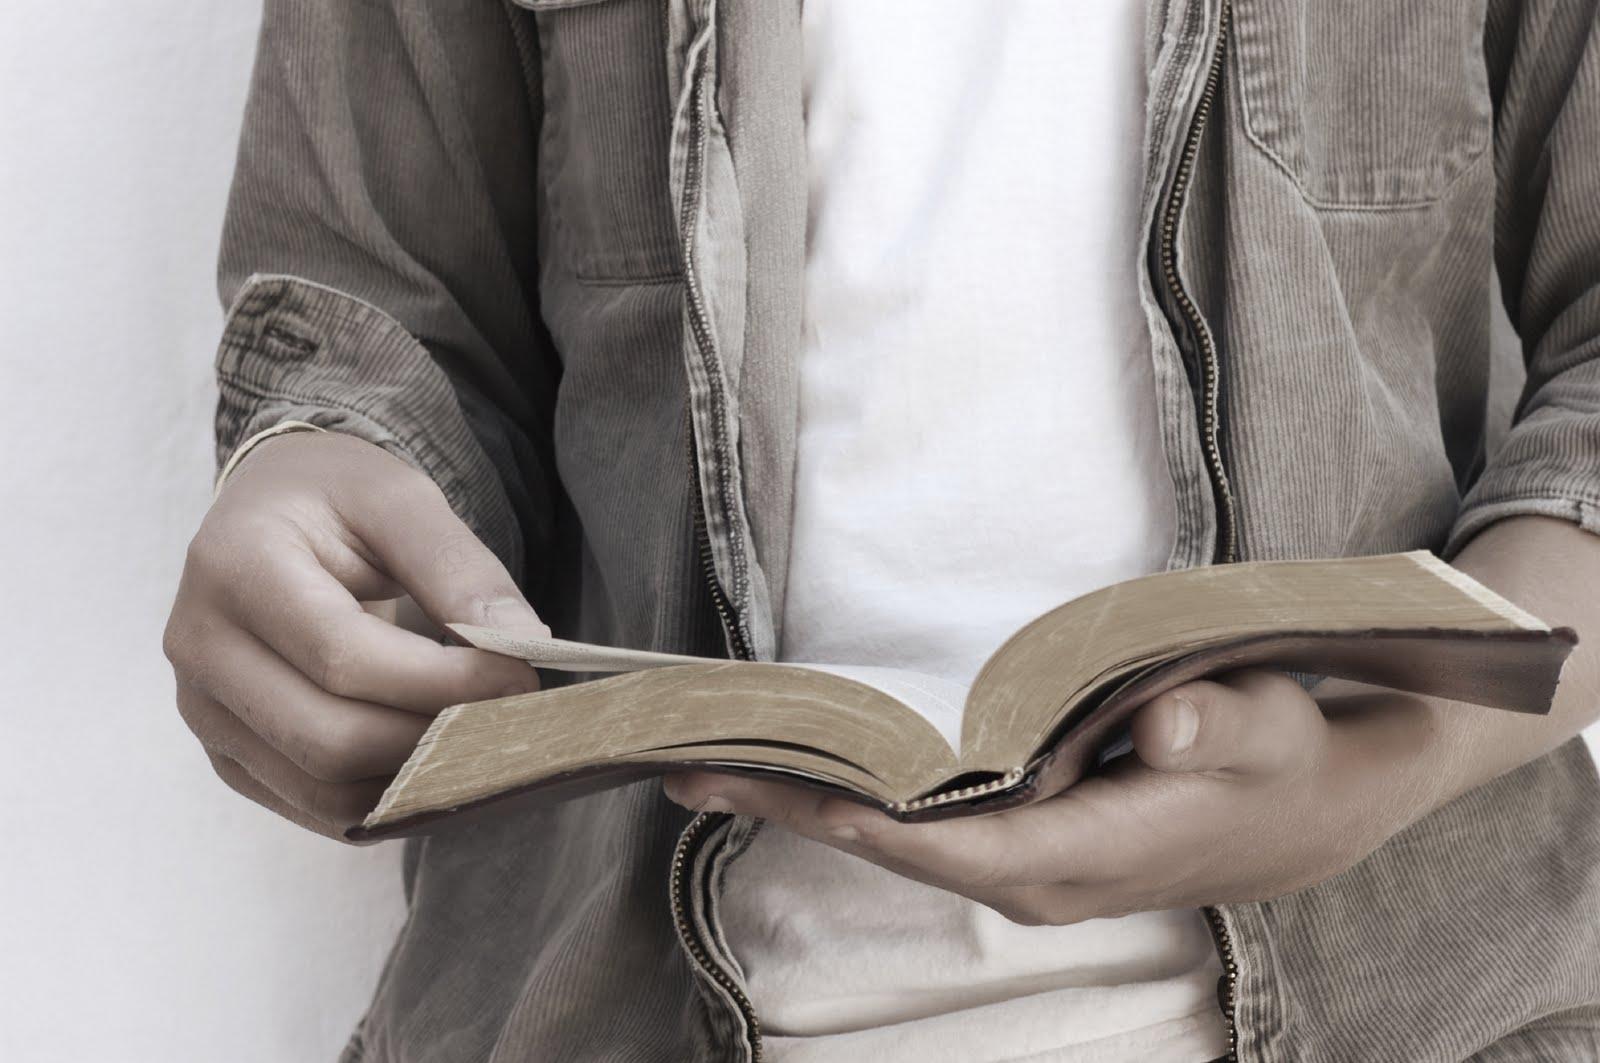 Como ler a Bíblia e Entende-la mais Facilmente